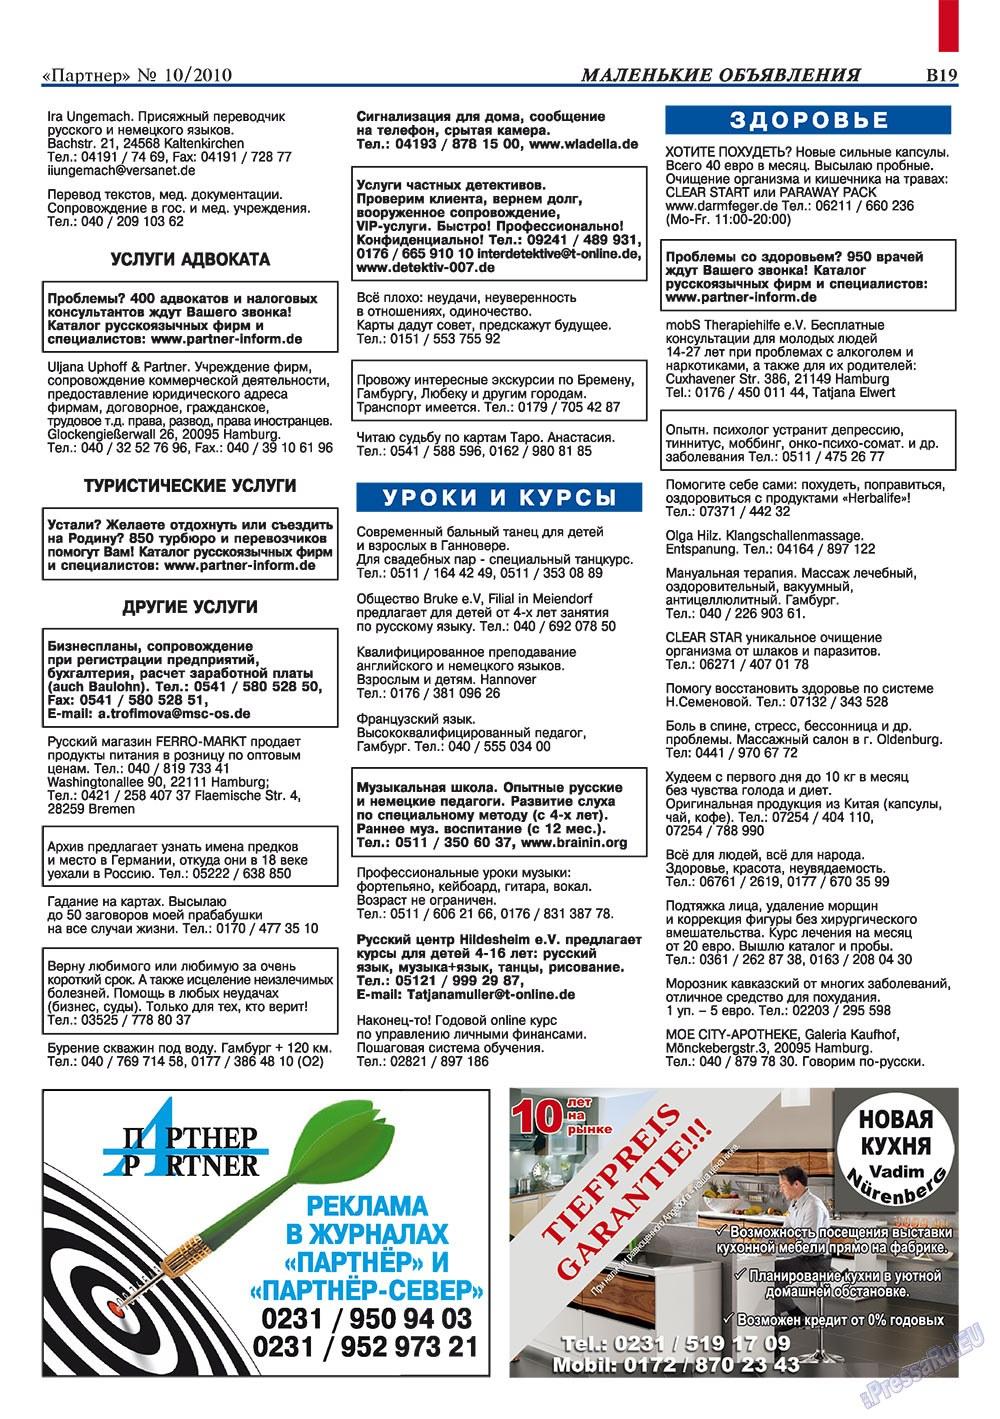 Партнер-север (журнал). 2010 год, номер 10, стр. 29